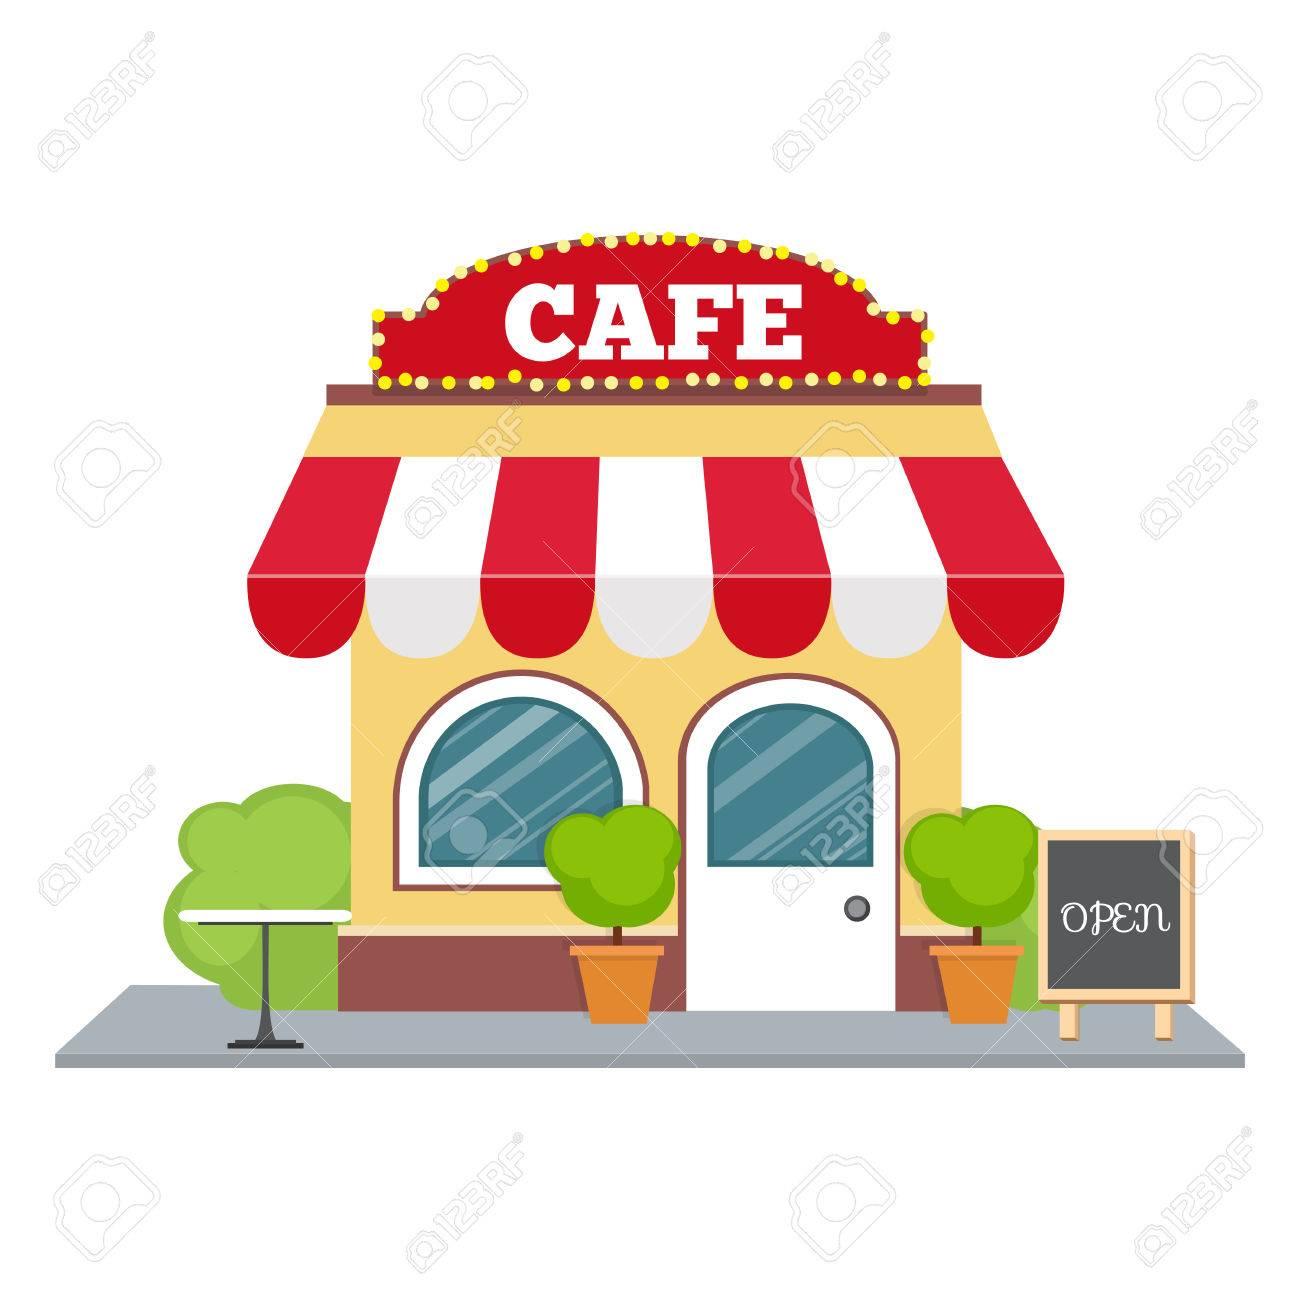 Building cartoon clipart restaurant building and restaurant building - Colorful Cafe Isometric Restaurant Building Cartoon Vector Icon Flat Isometric Design Stock Vector